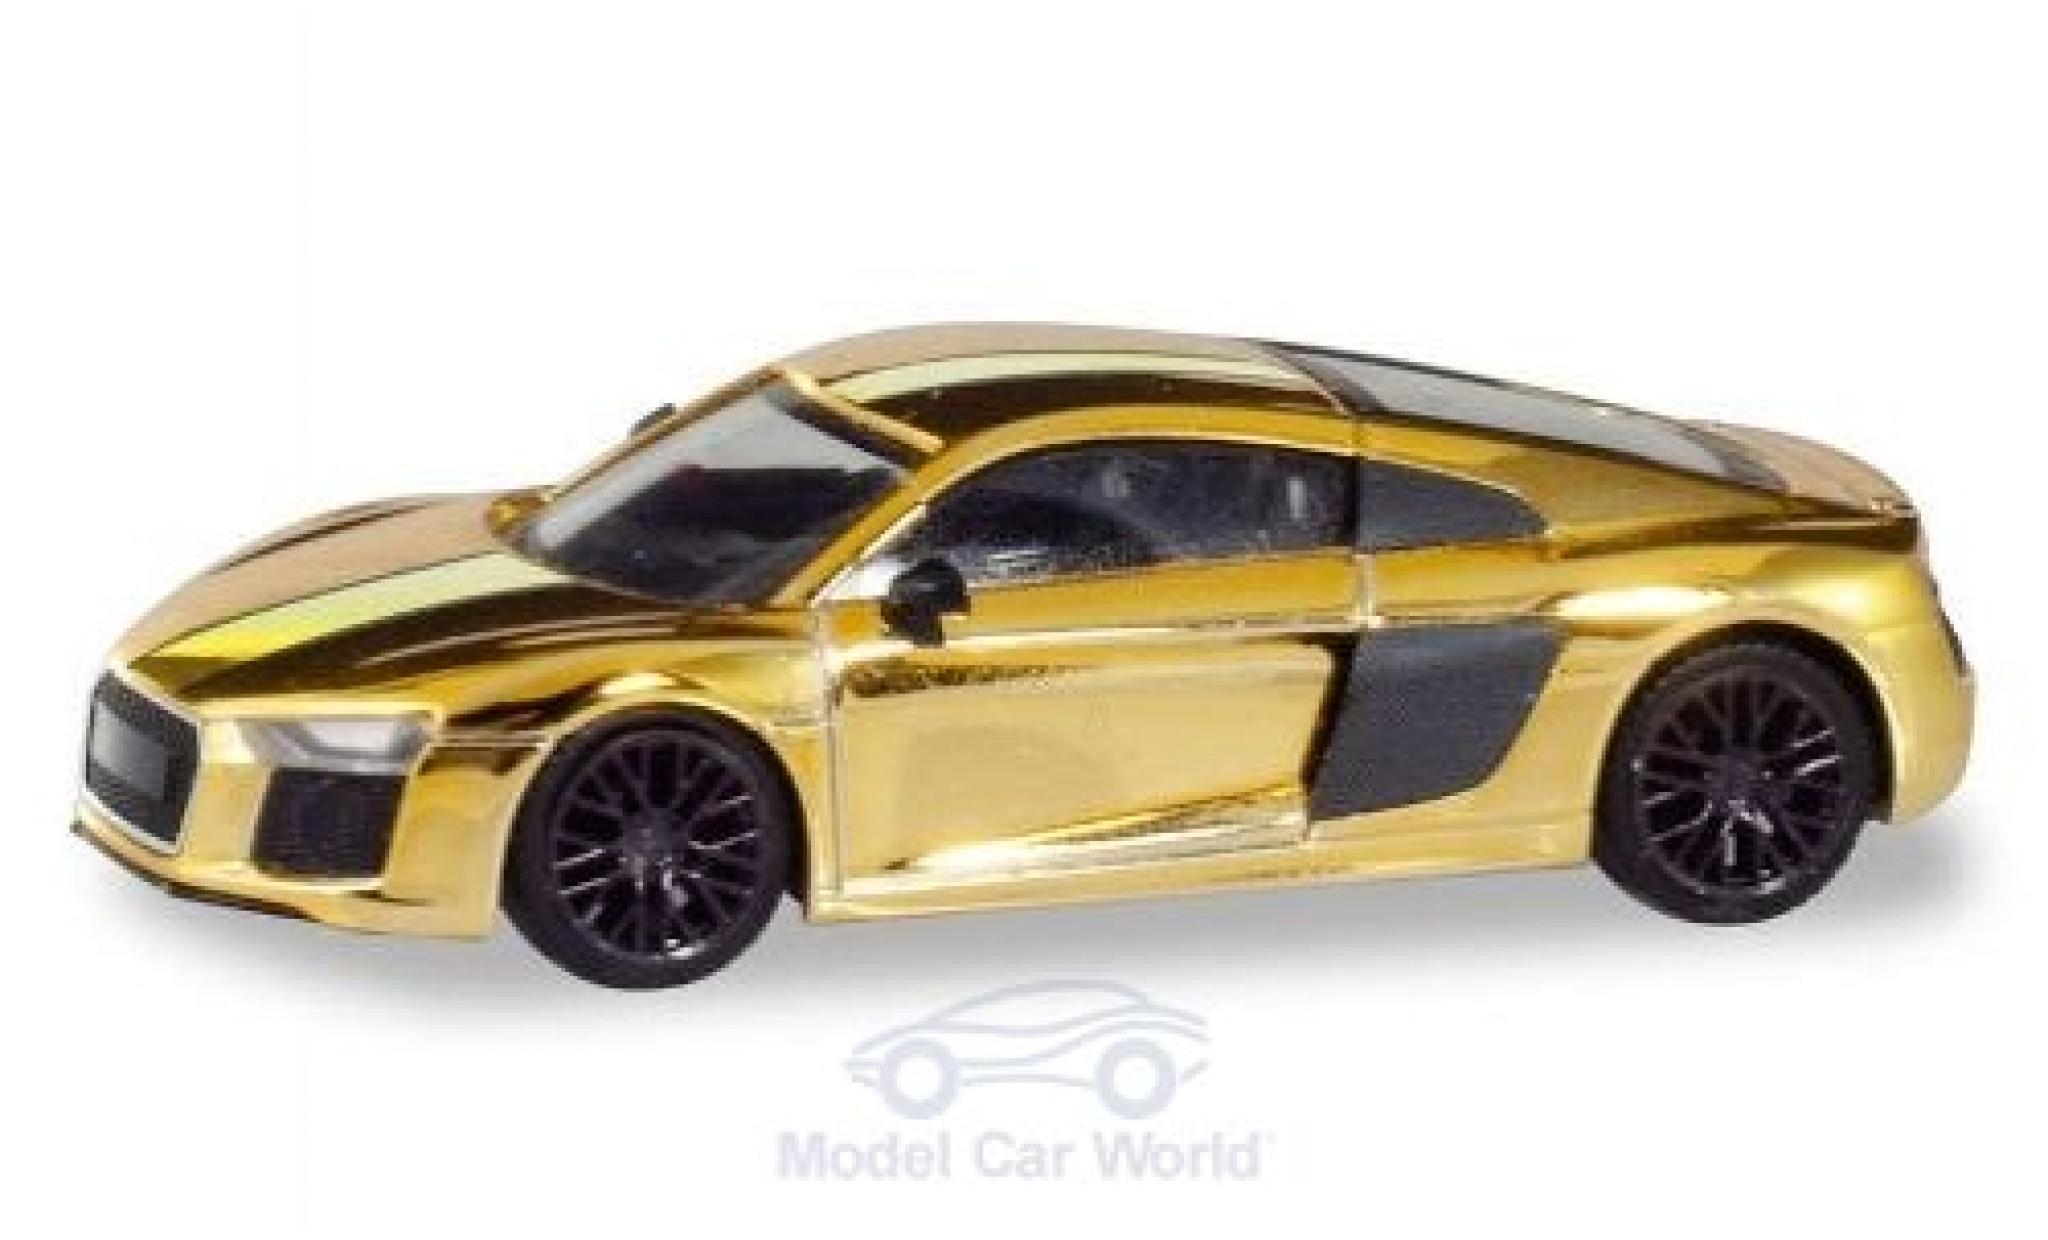 Audi R8 1/87 Herpa V10 Plus gold Felgen: schwarz